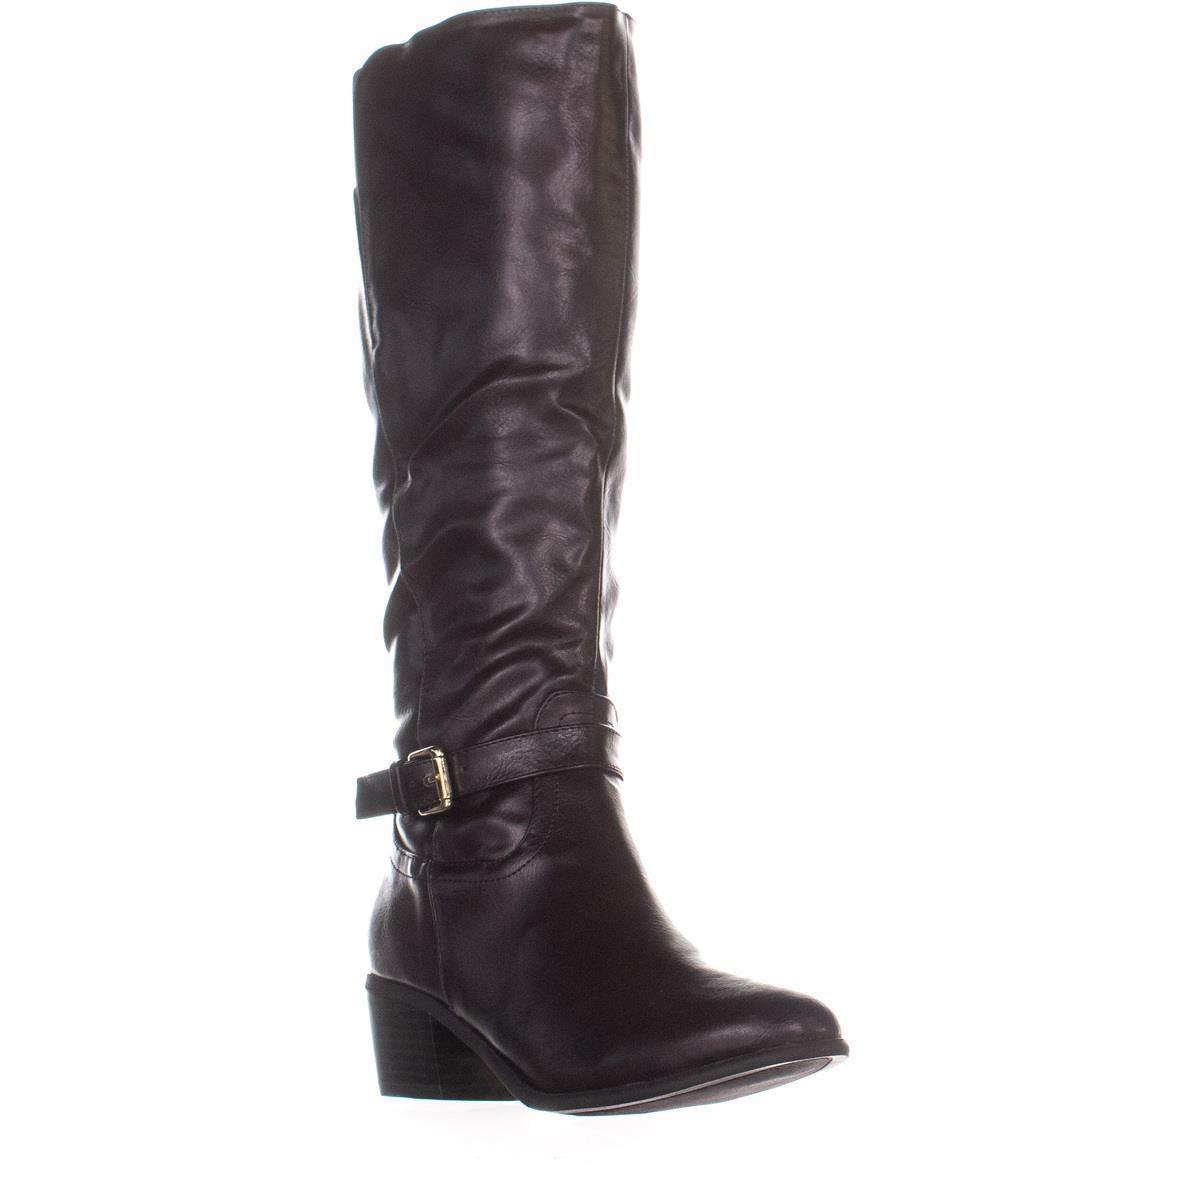 Dark Brown Karen Scott KS35 Fayth Below The Knee Riding Boots, Black